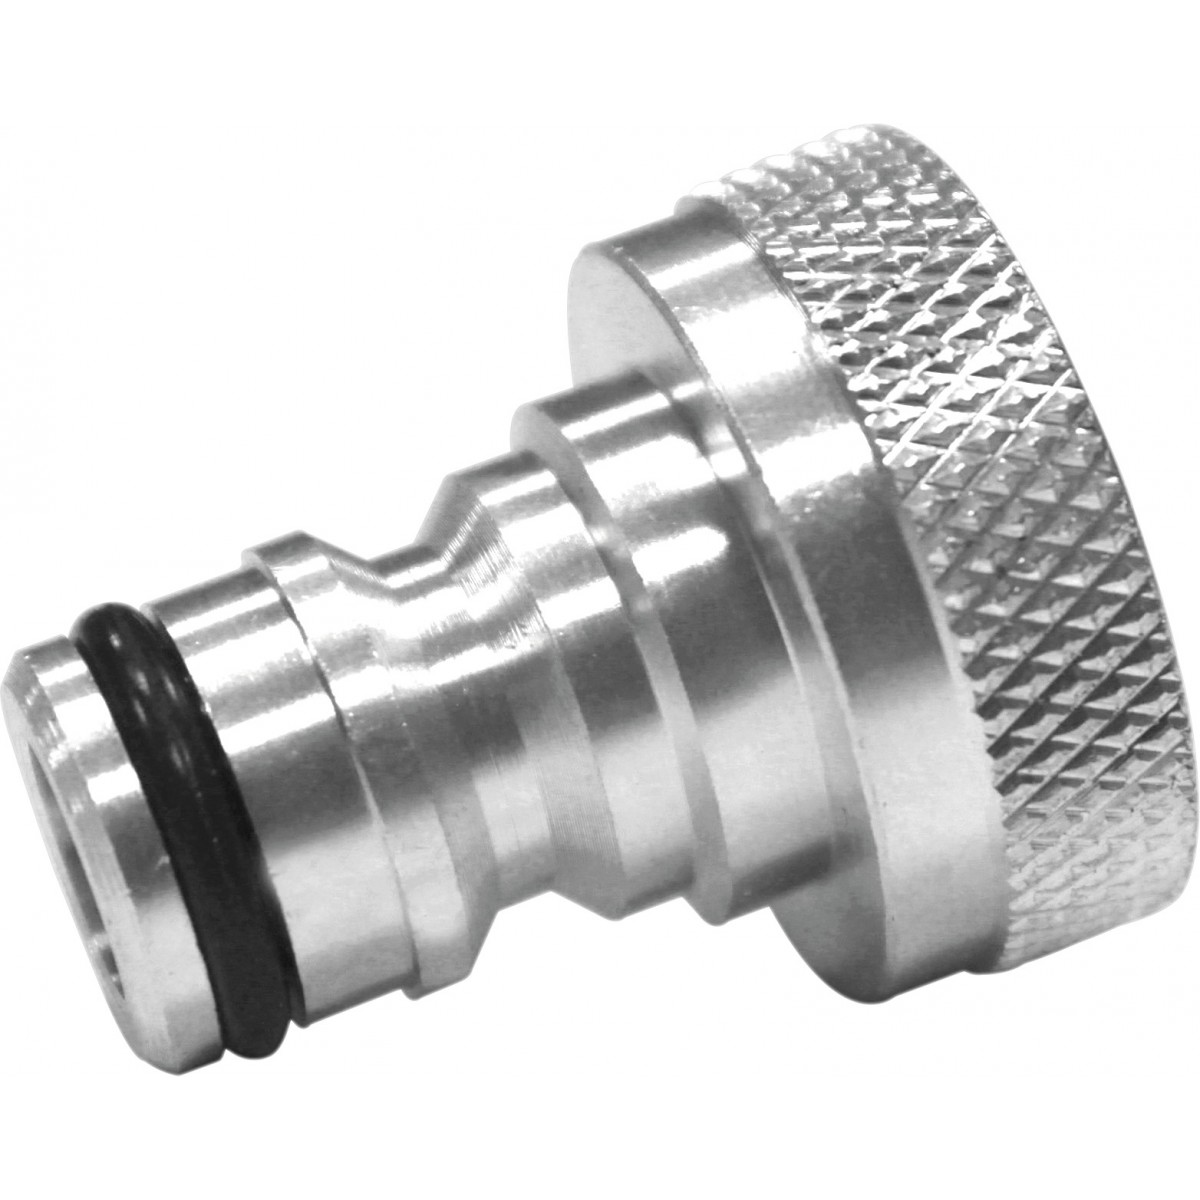 Nez de robinet Femelle Cap Vert - Filetage 15 x 21 mm